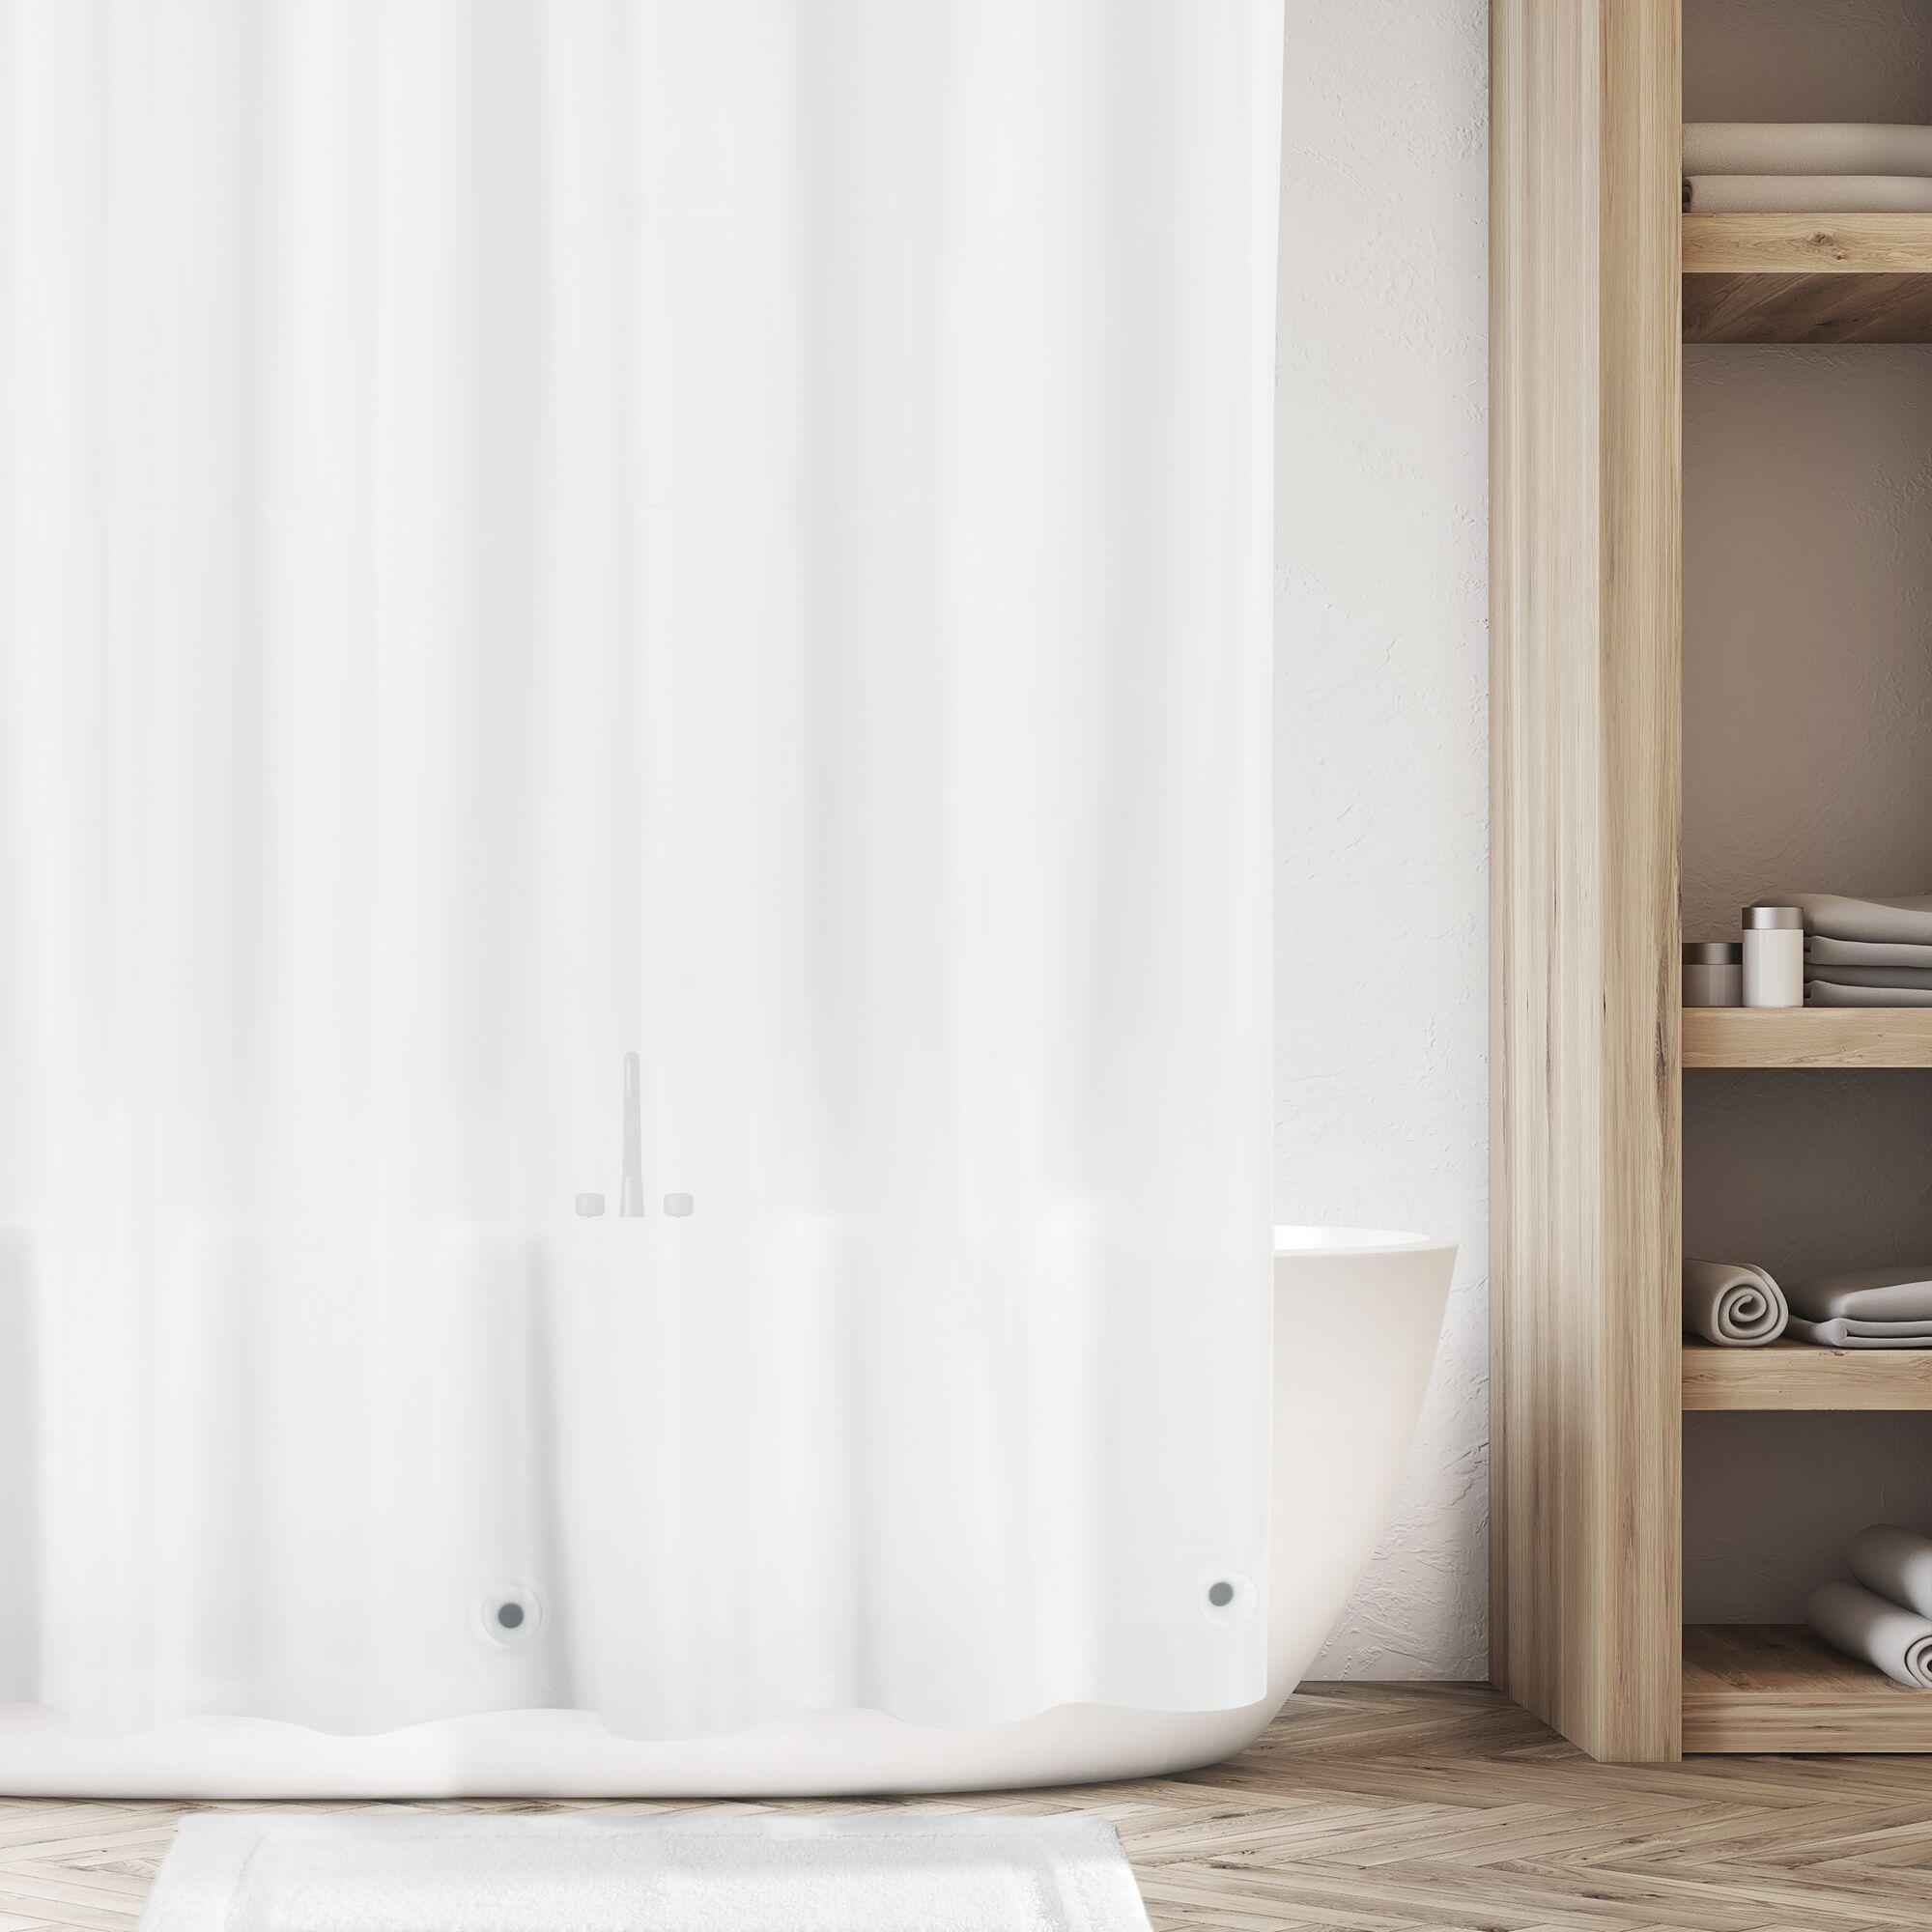 mDesign-Premium-Waterproof-Vinyl-Shower-Curtain-Liner-72-034-x-72-034 miniatuur 32